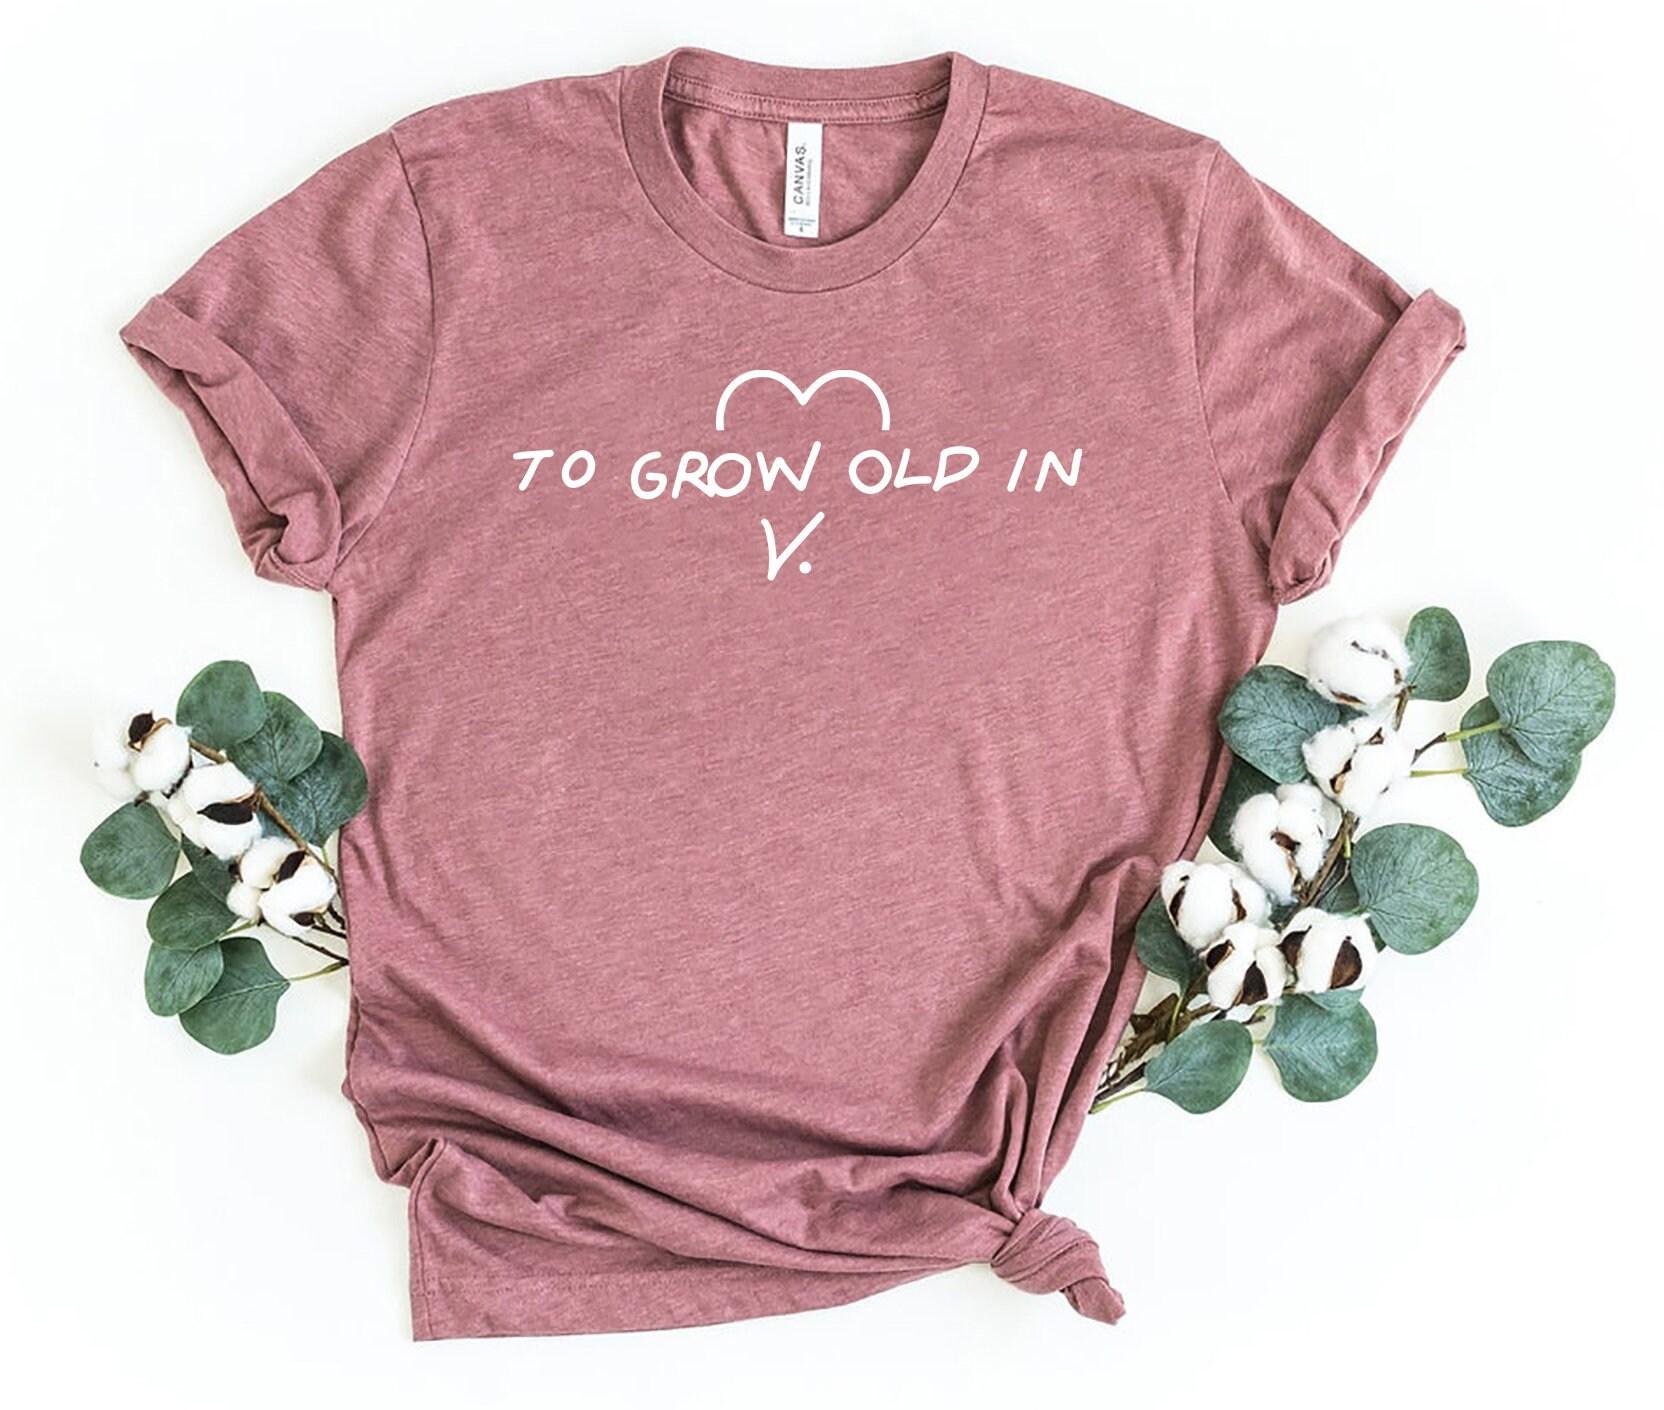 Scarlet Shirt Scarlet Witch Shirt To Grow Old In V Shirt Wandavision Shirt Agatha All Along Shirt